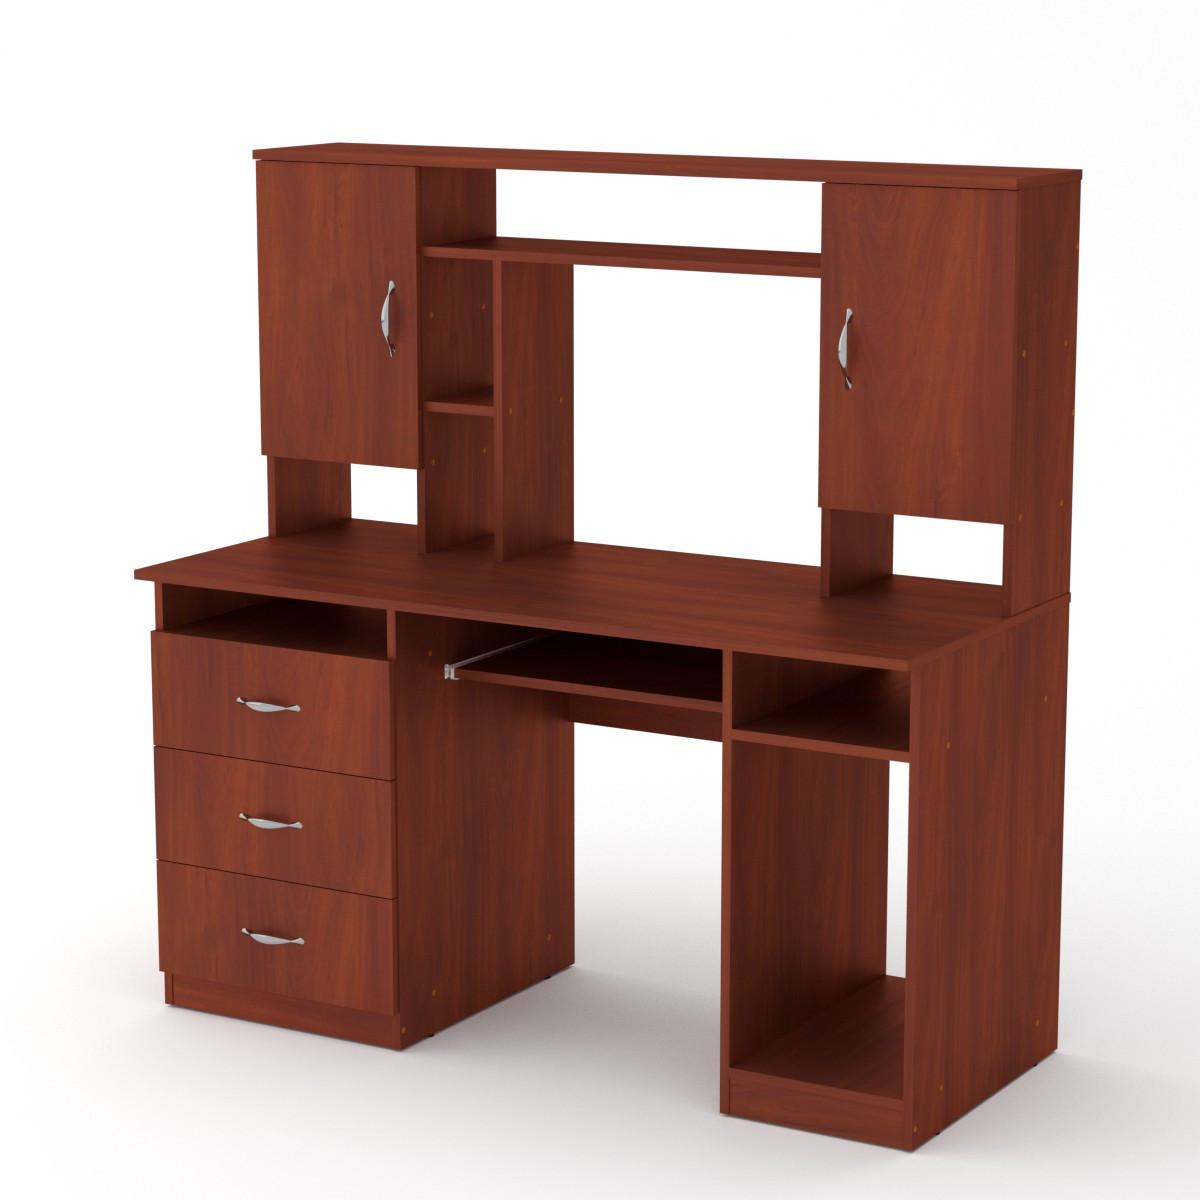 Стол компьютерный менеджер яблоня Компанит (140х60х142 см)